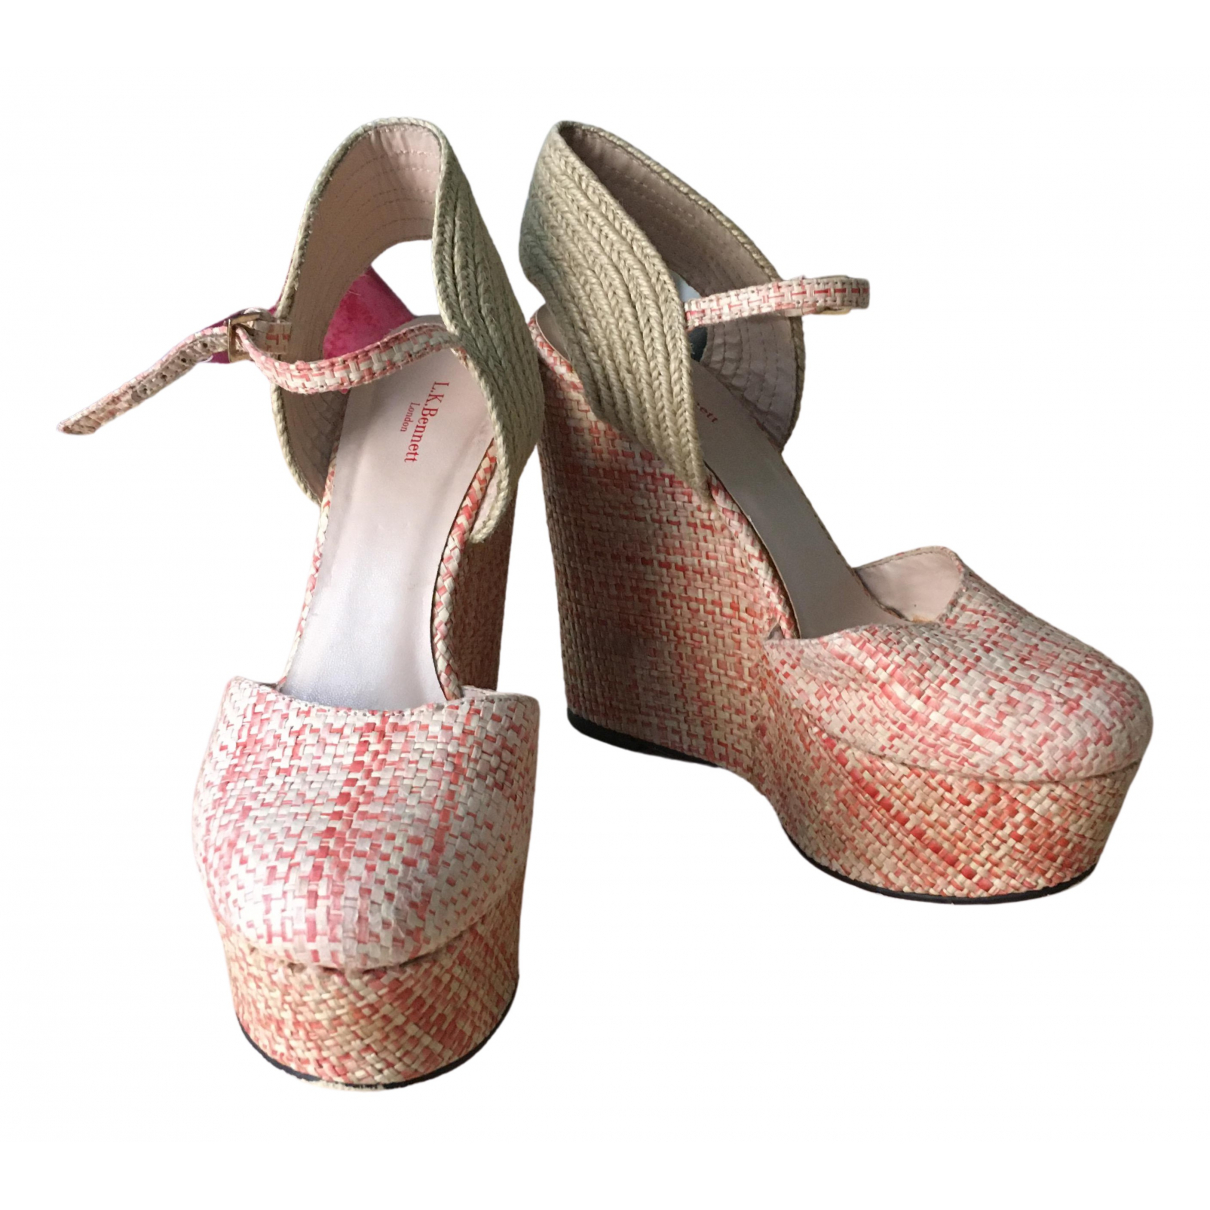 Sandalias de Lona Lk Bennett